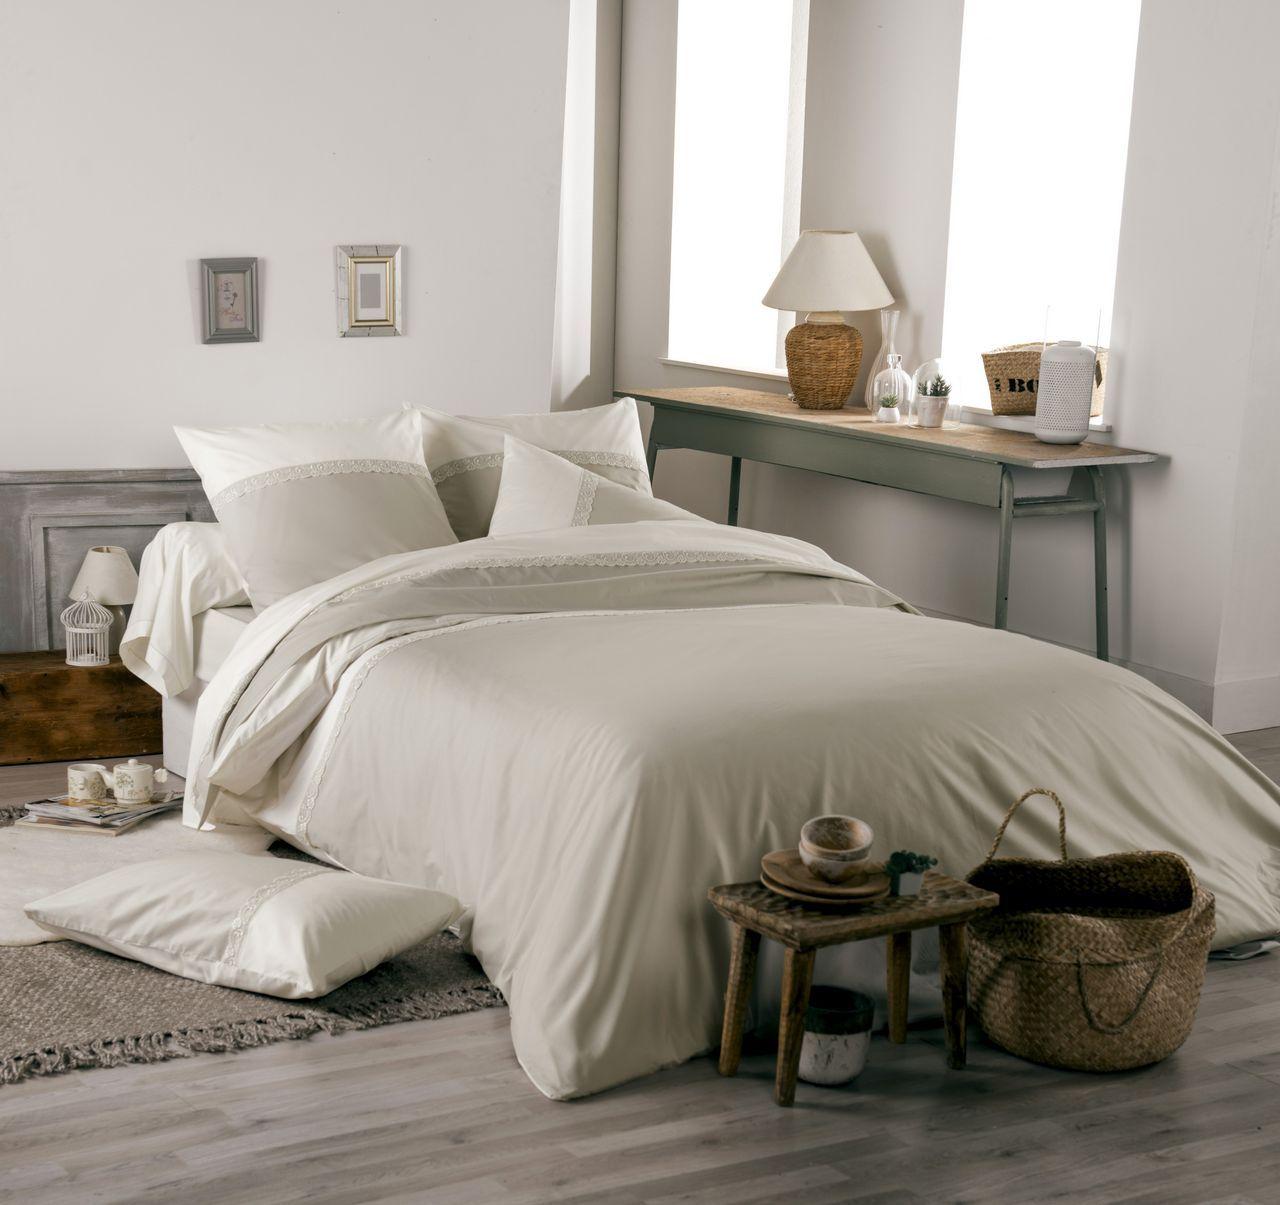 drap plat idylle percale beige coquille galon dentelle 280x310. Black Bedroom Furniture Sets. Home Design Ideas